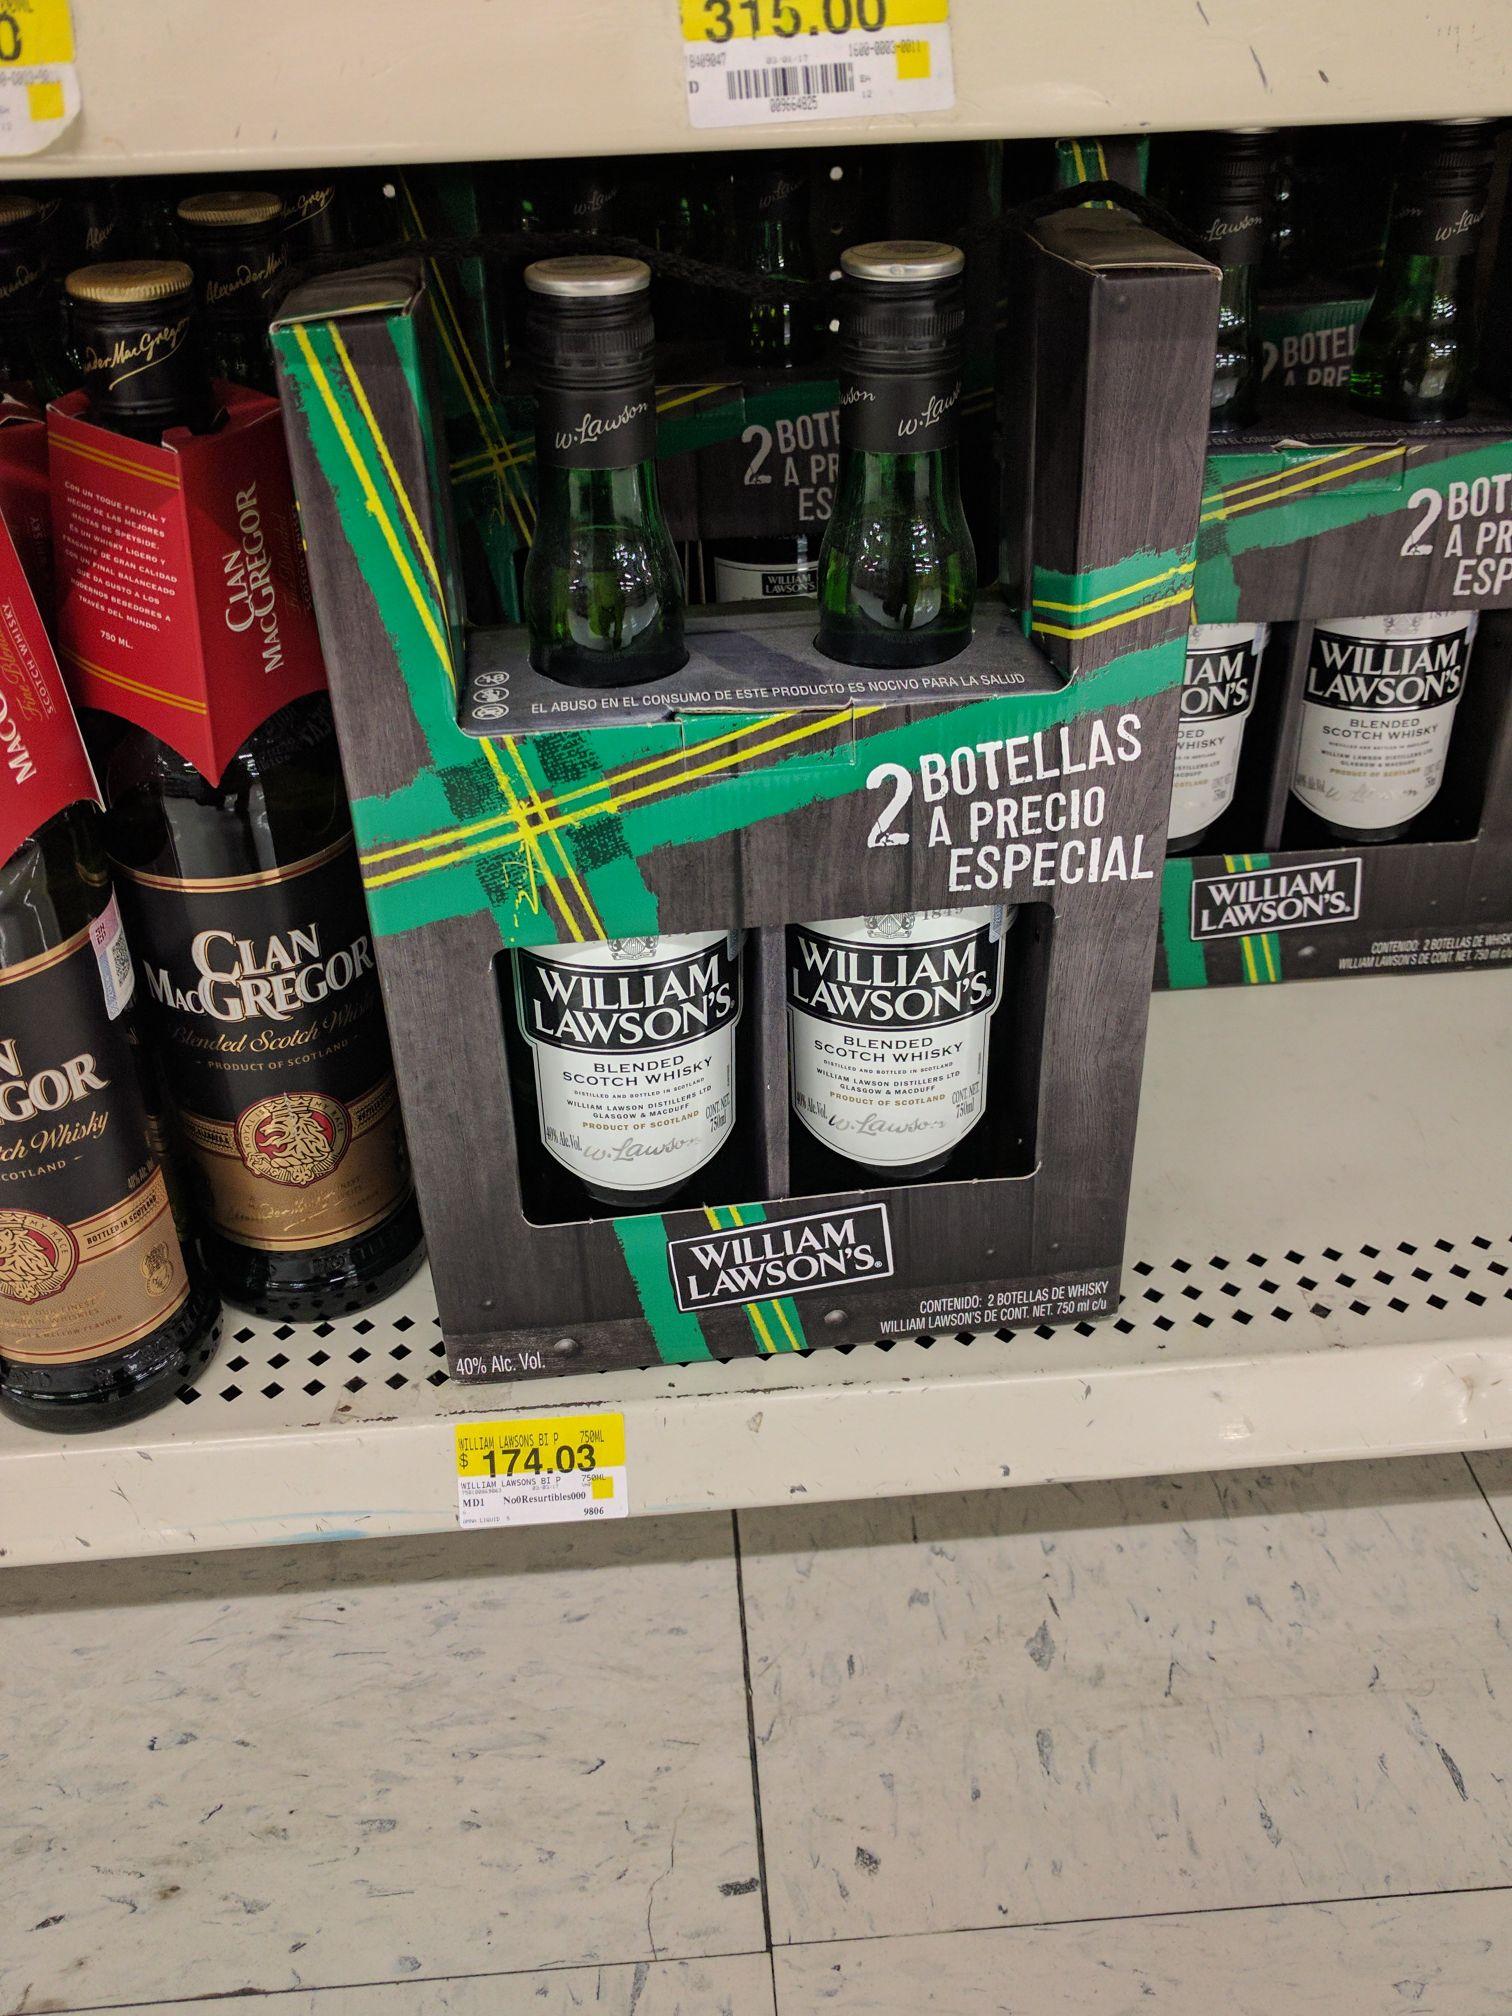 Walmart galerías Ags. 1.5 Lts whisky William Lawson